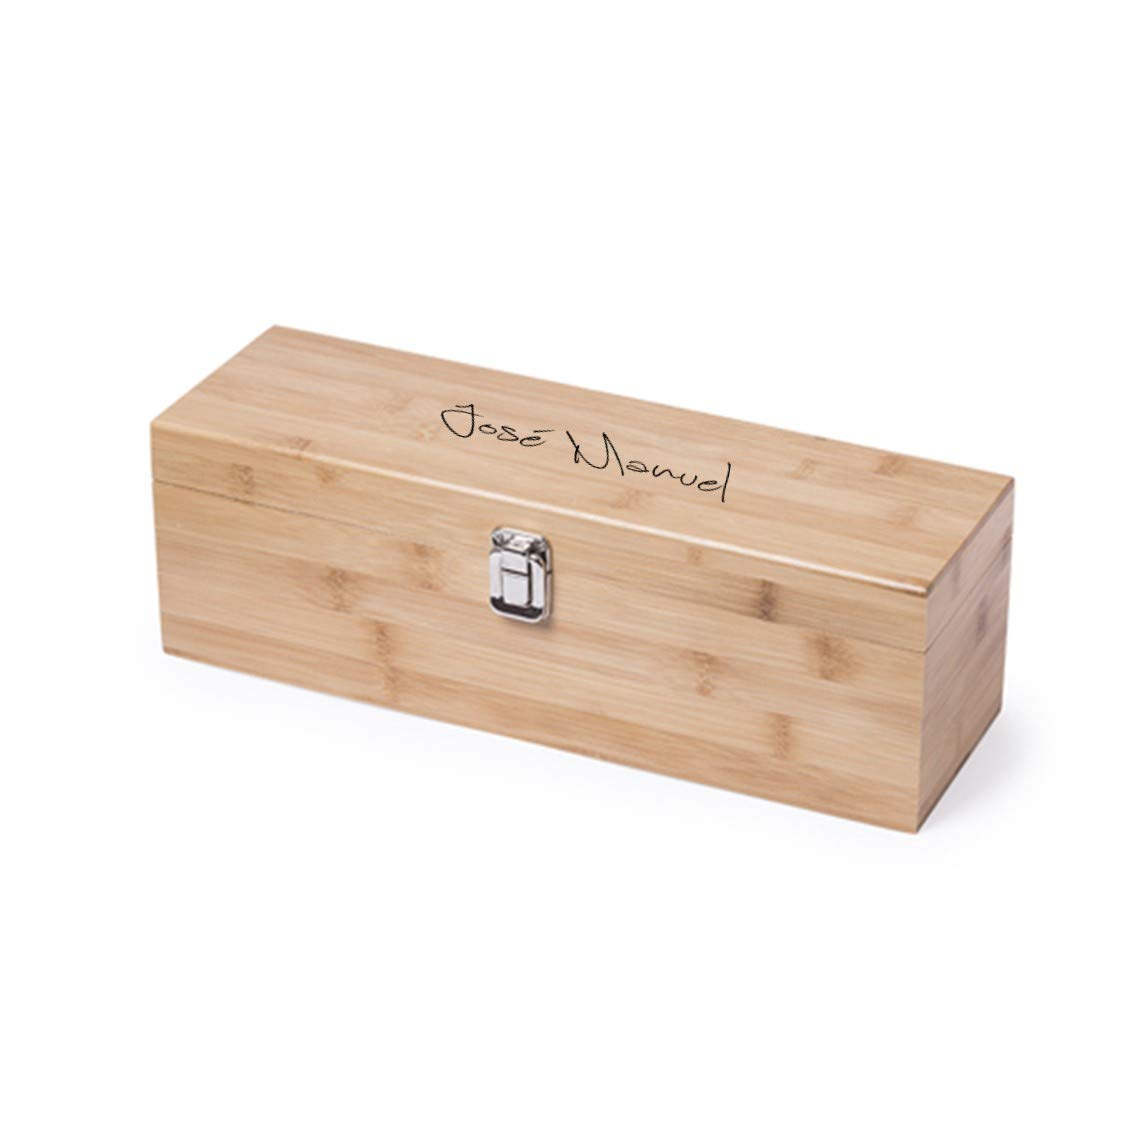 Caja para Botella de Vino con accesorios incluidos ...